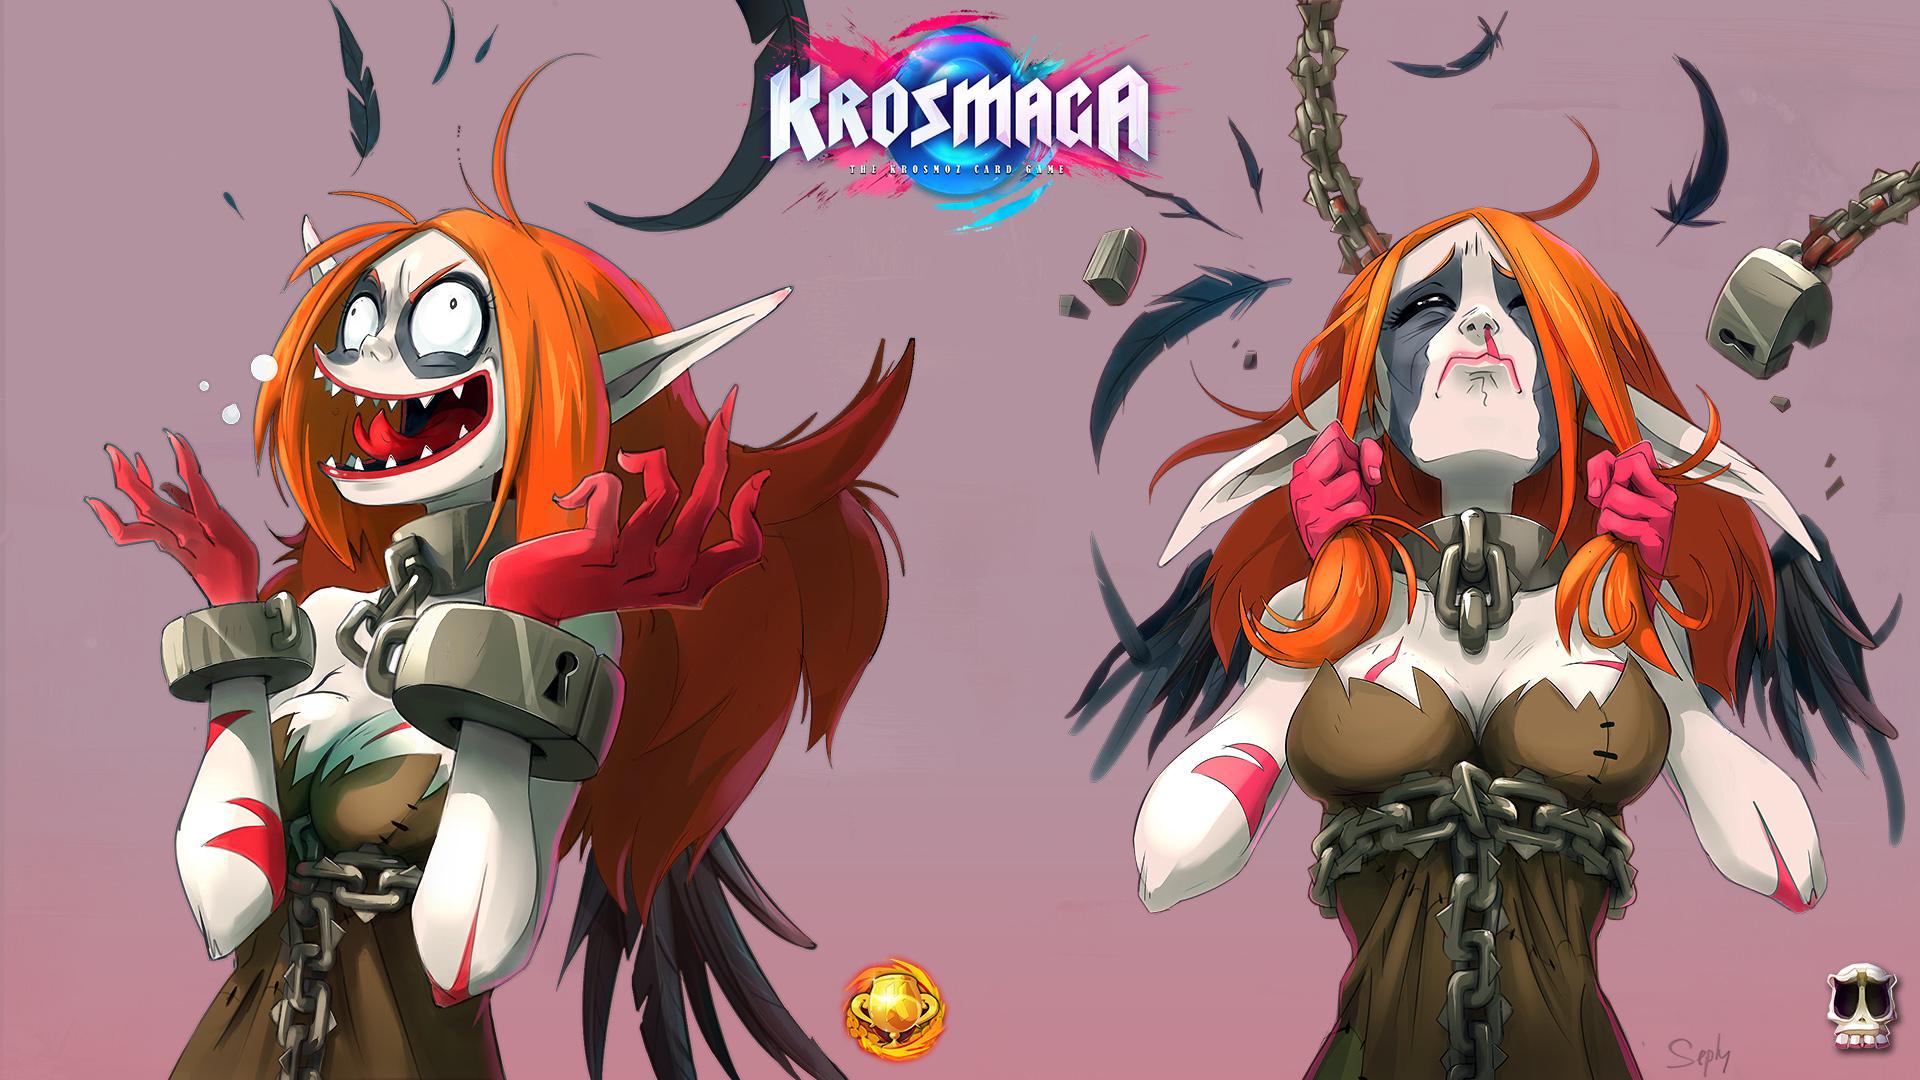 Krosmaga - God illustrations: Sacrier Defeat & Victory.